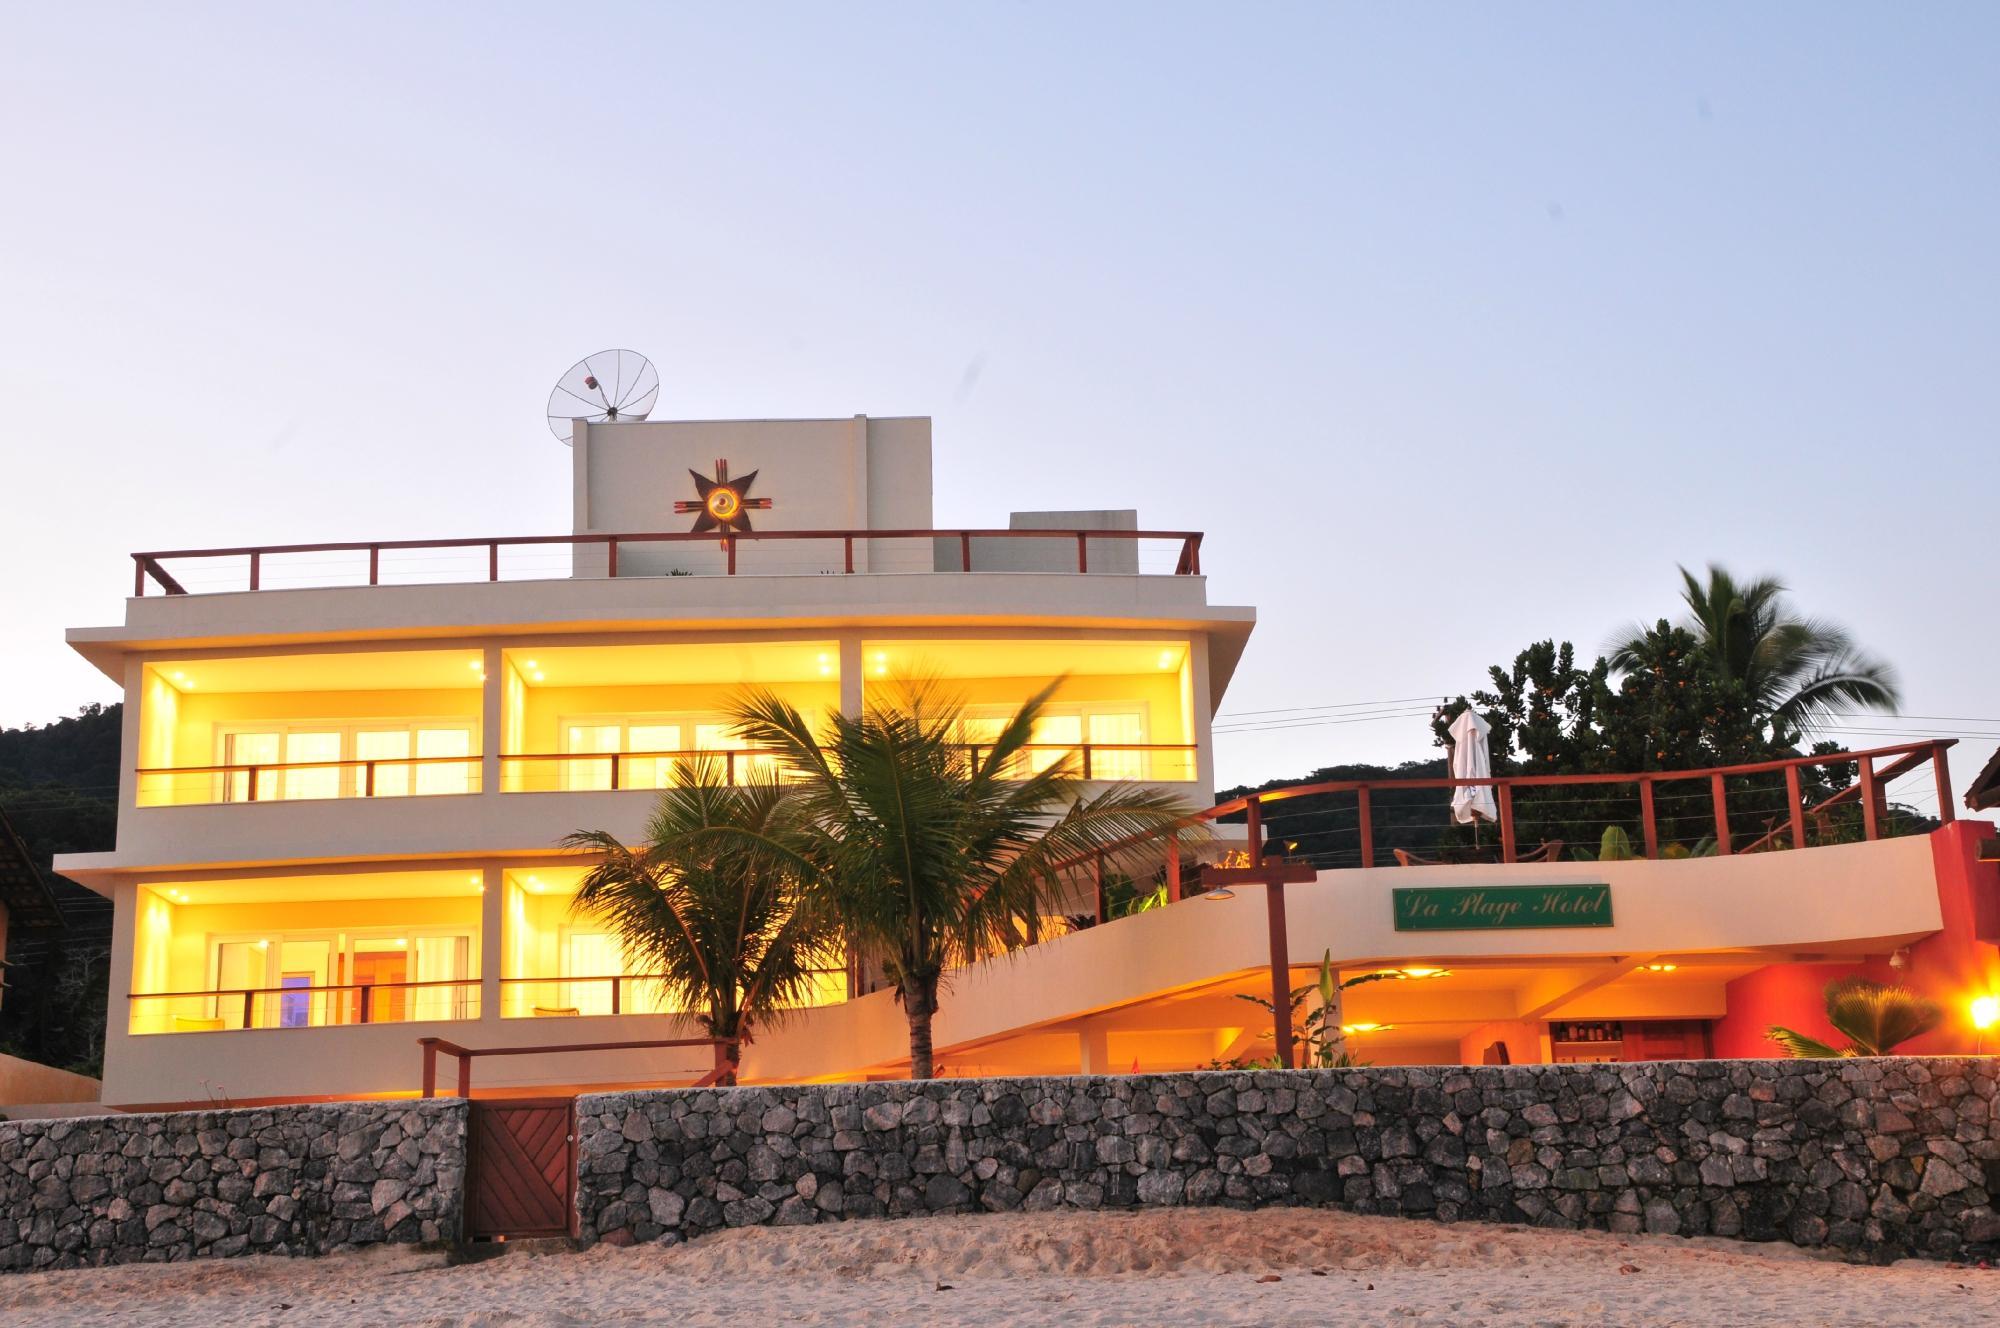 Juquehy La Plage Hotel